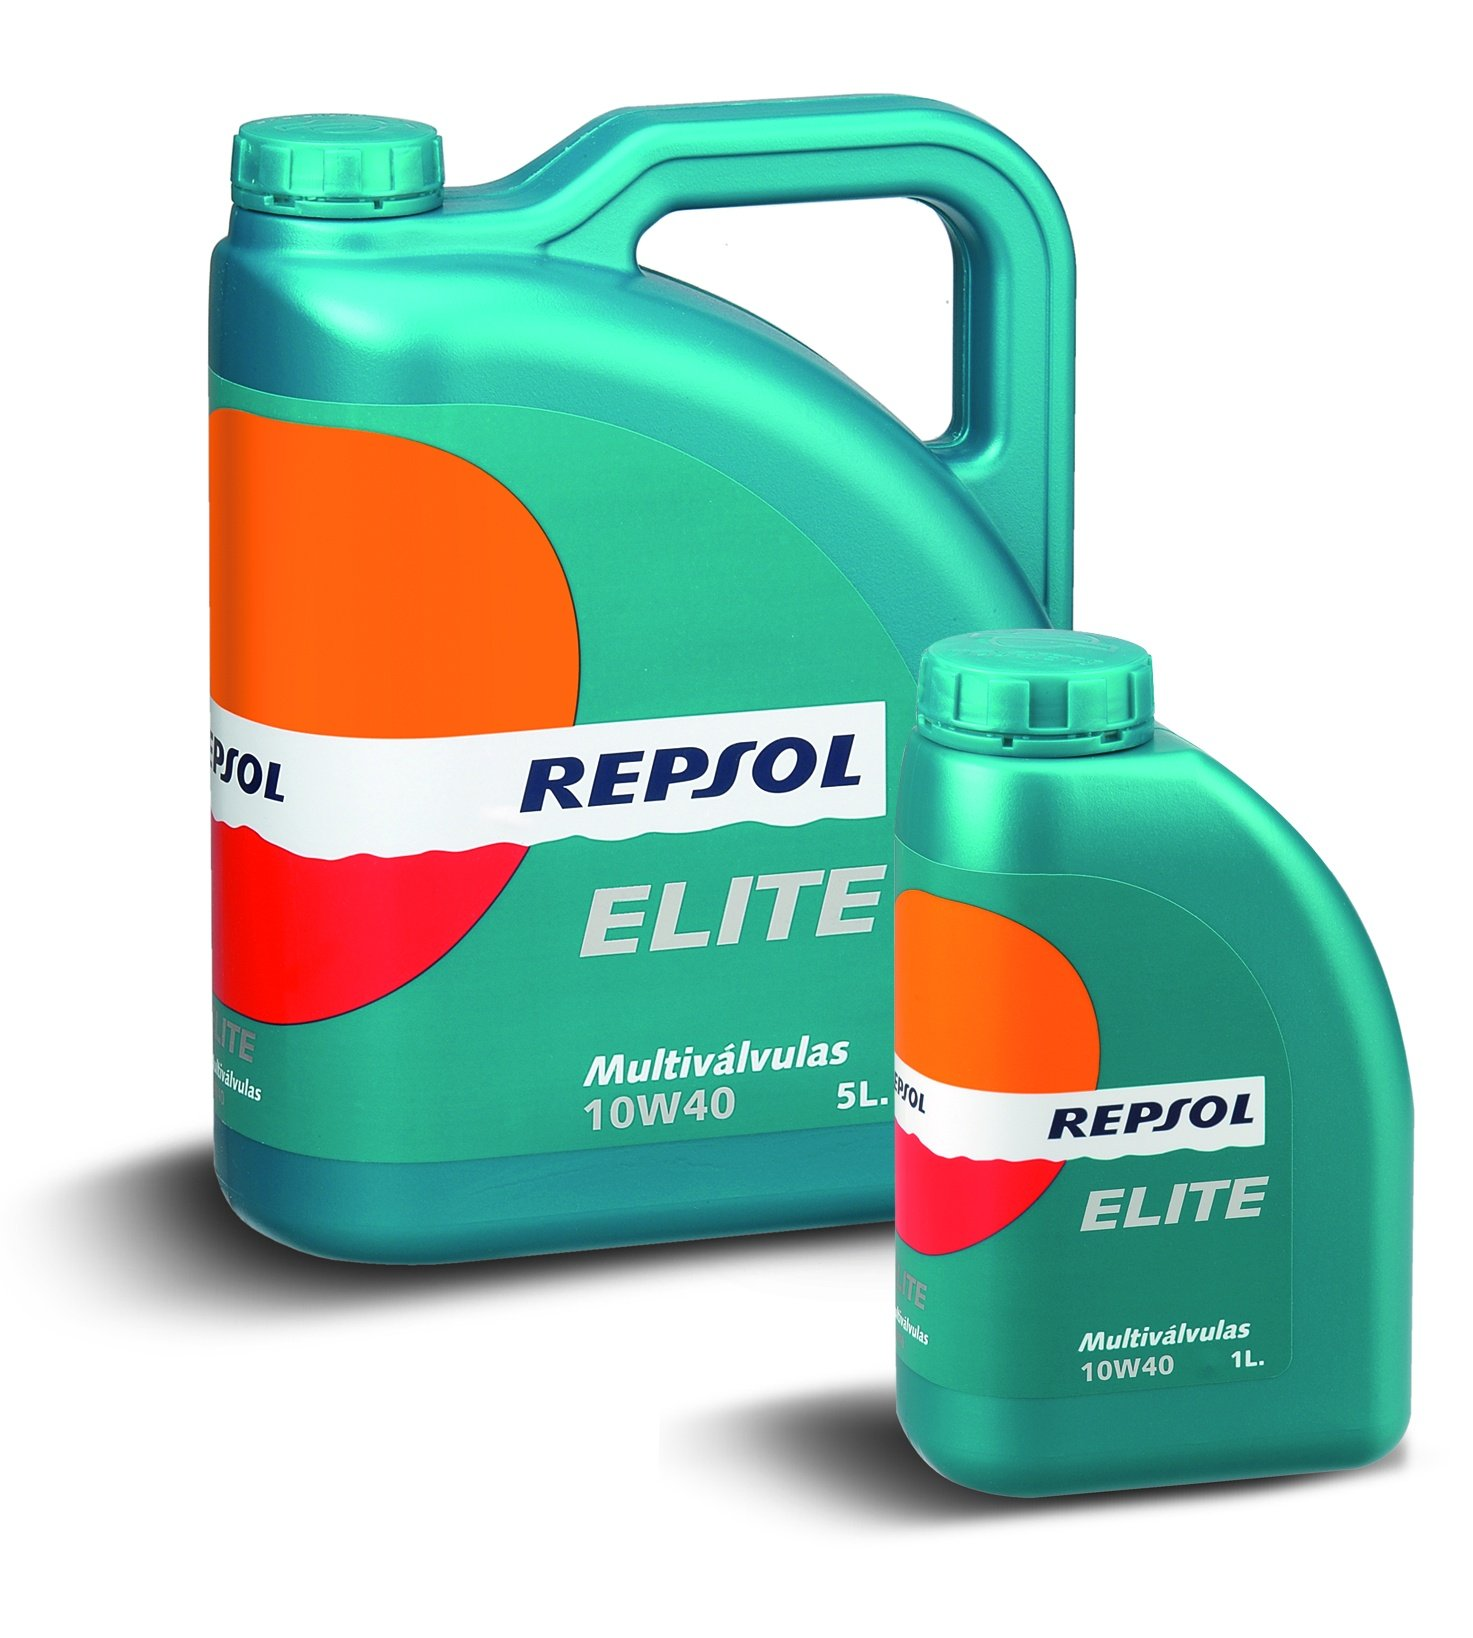 Repsol Elite Multivalvulas 10w-40 4 л